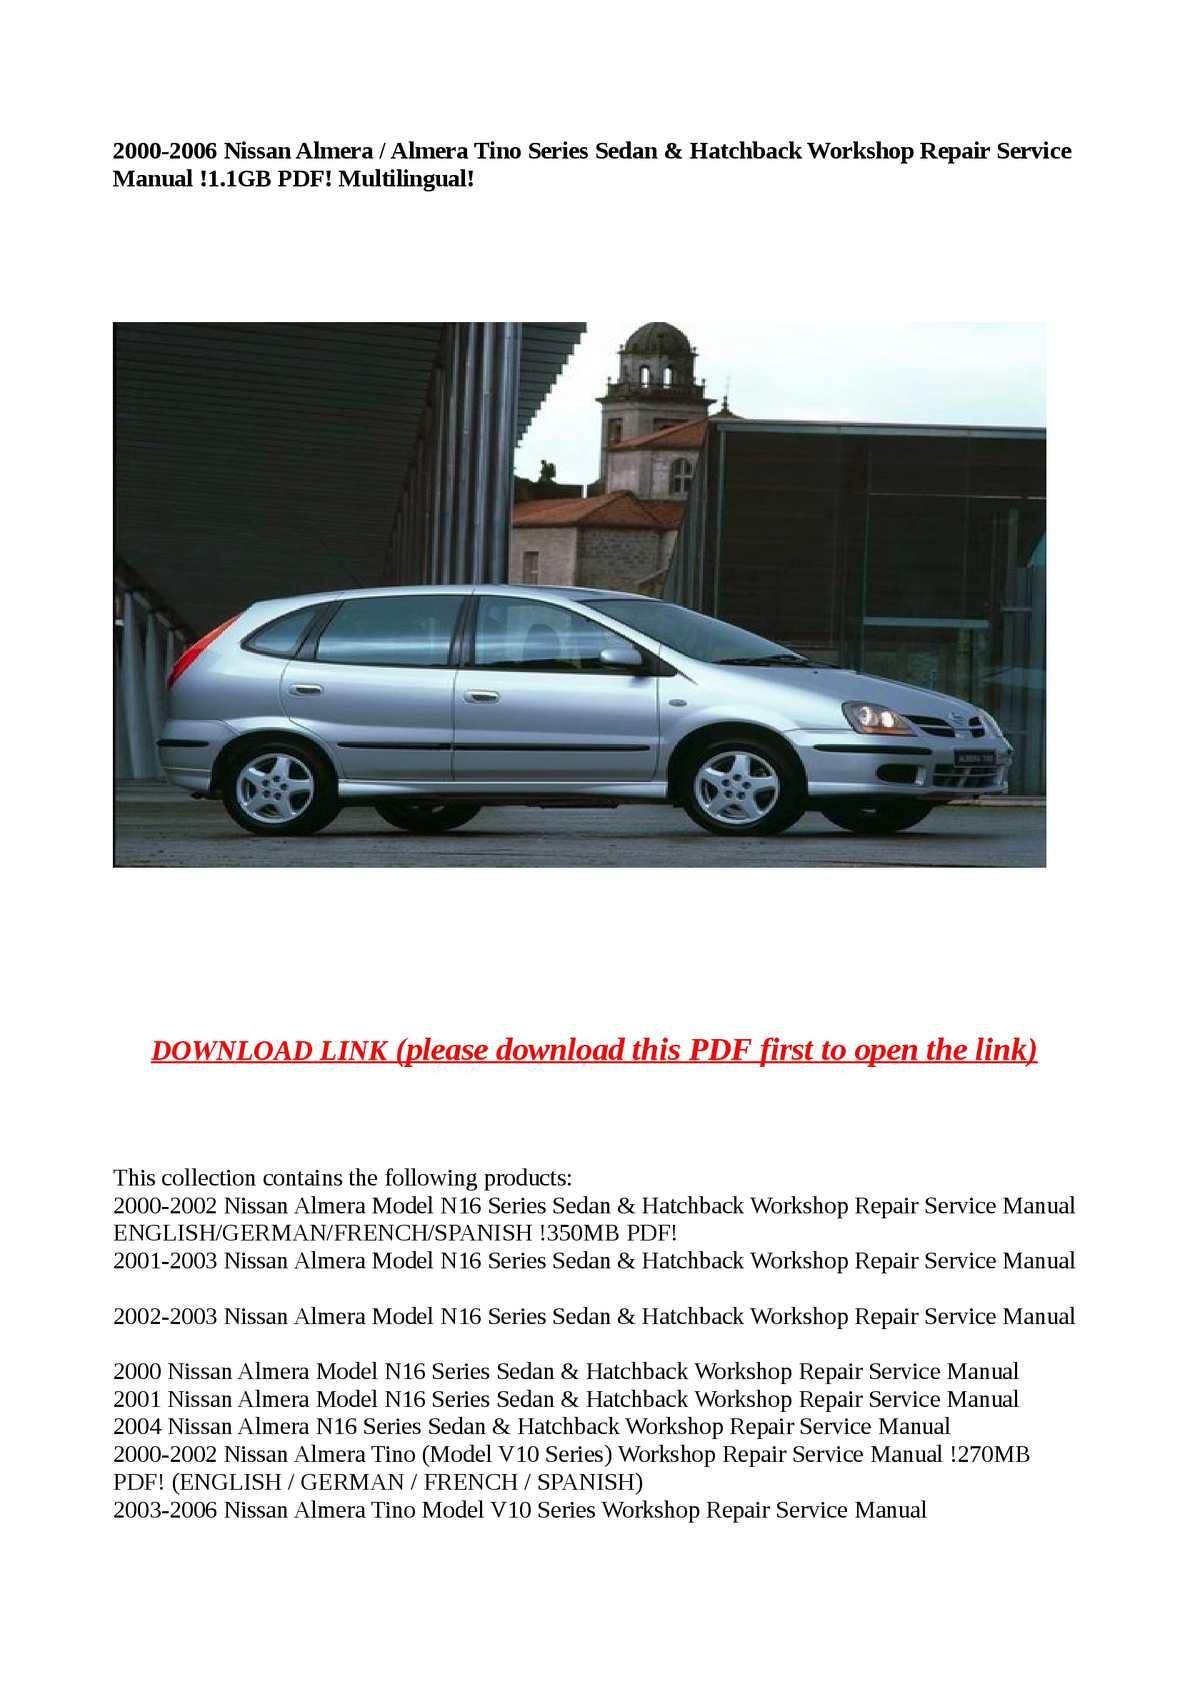 Calaméo - 2000-2006 Nissan Almera / Almera Tino Series Sedan & Hatchback  Workshop Repair Service Manual !1.1GB PDF! Multilingual!